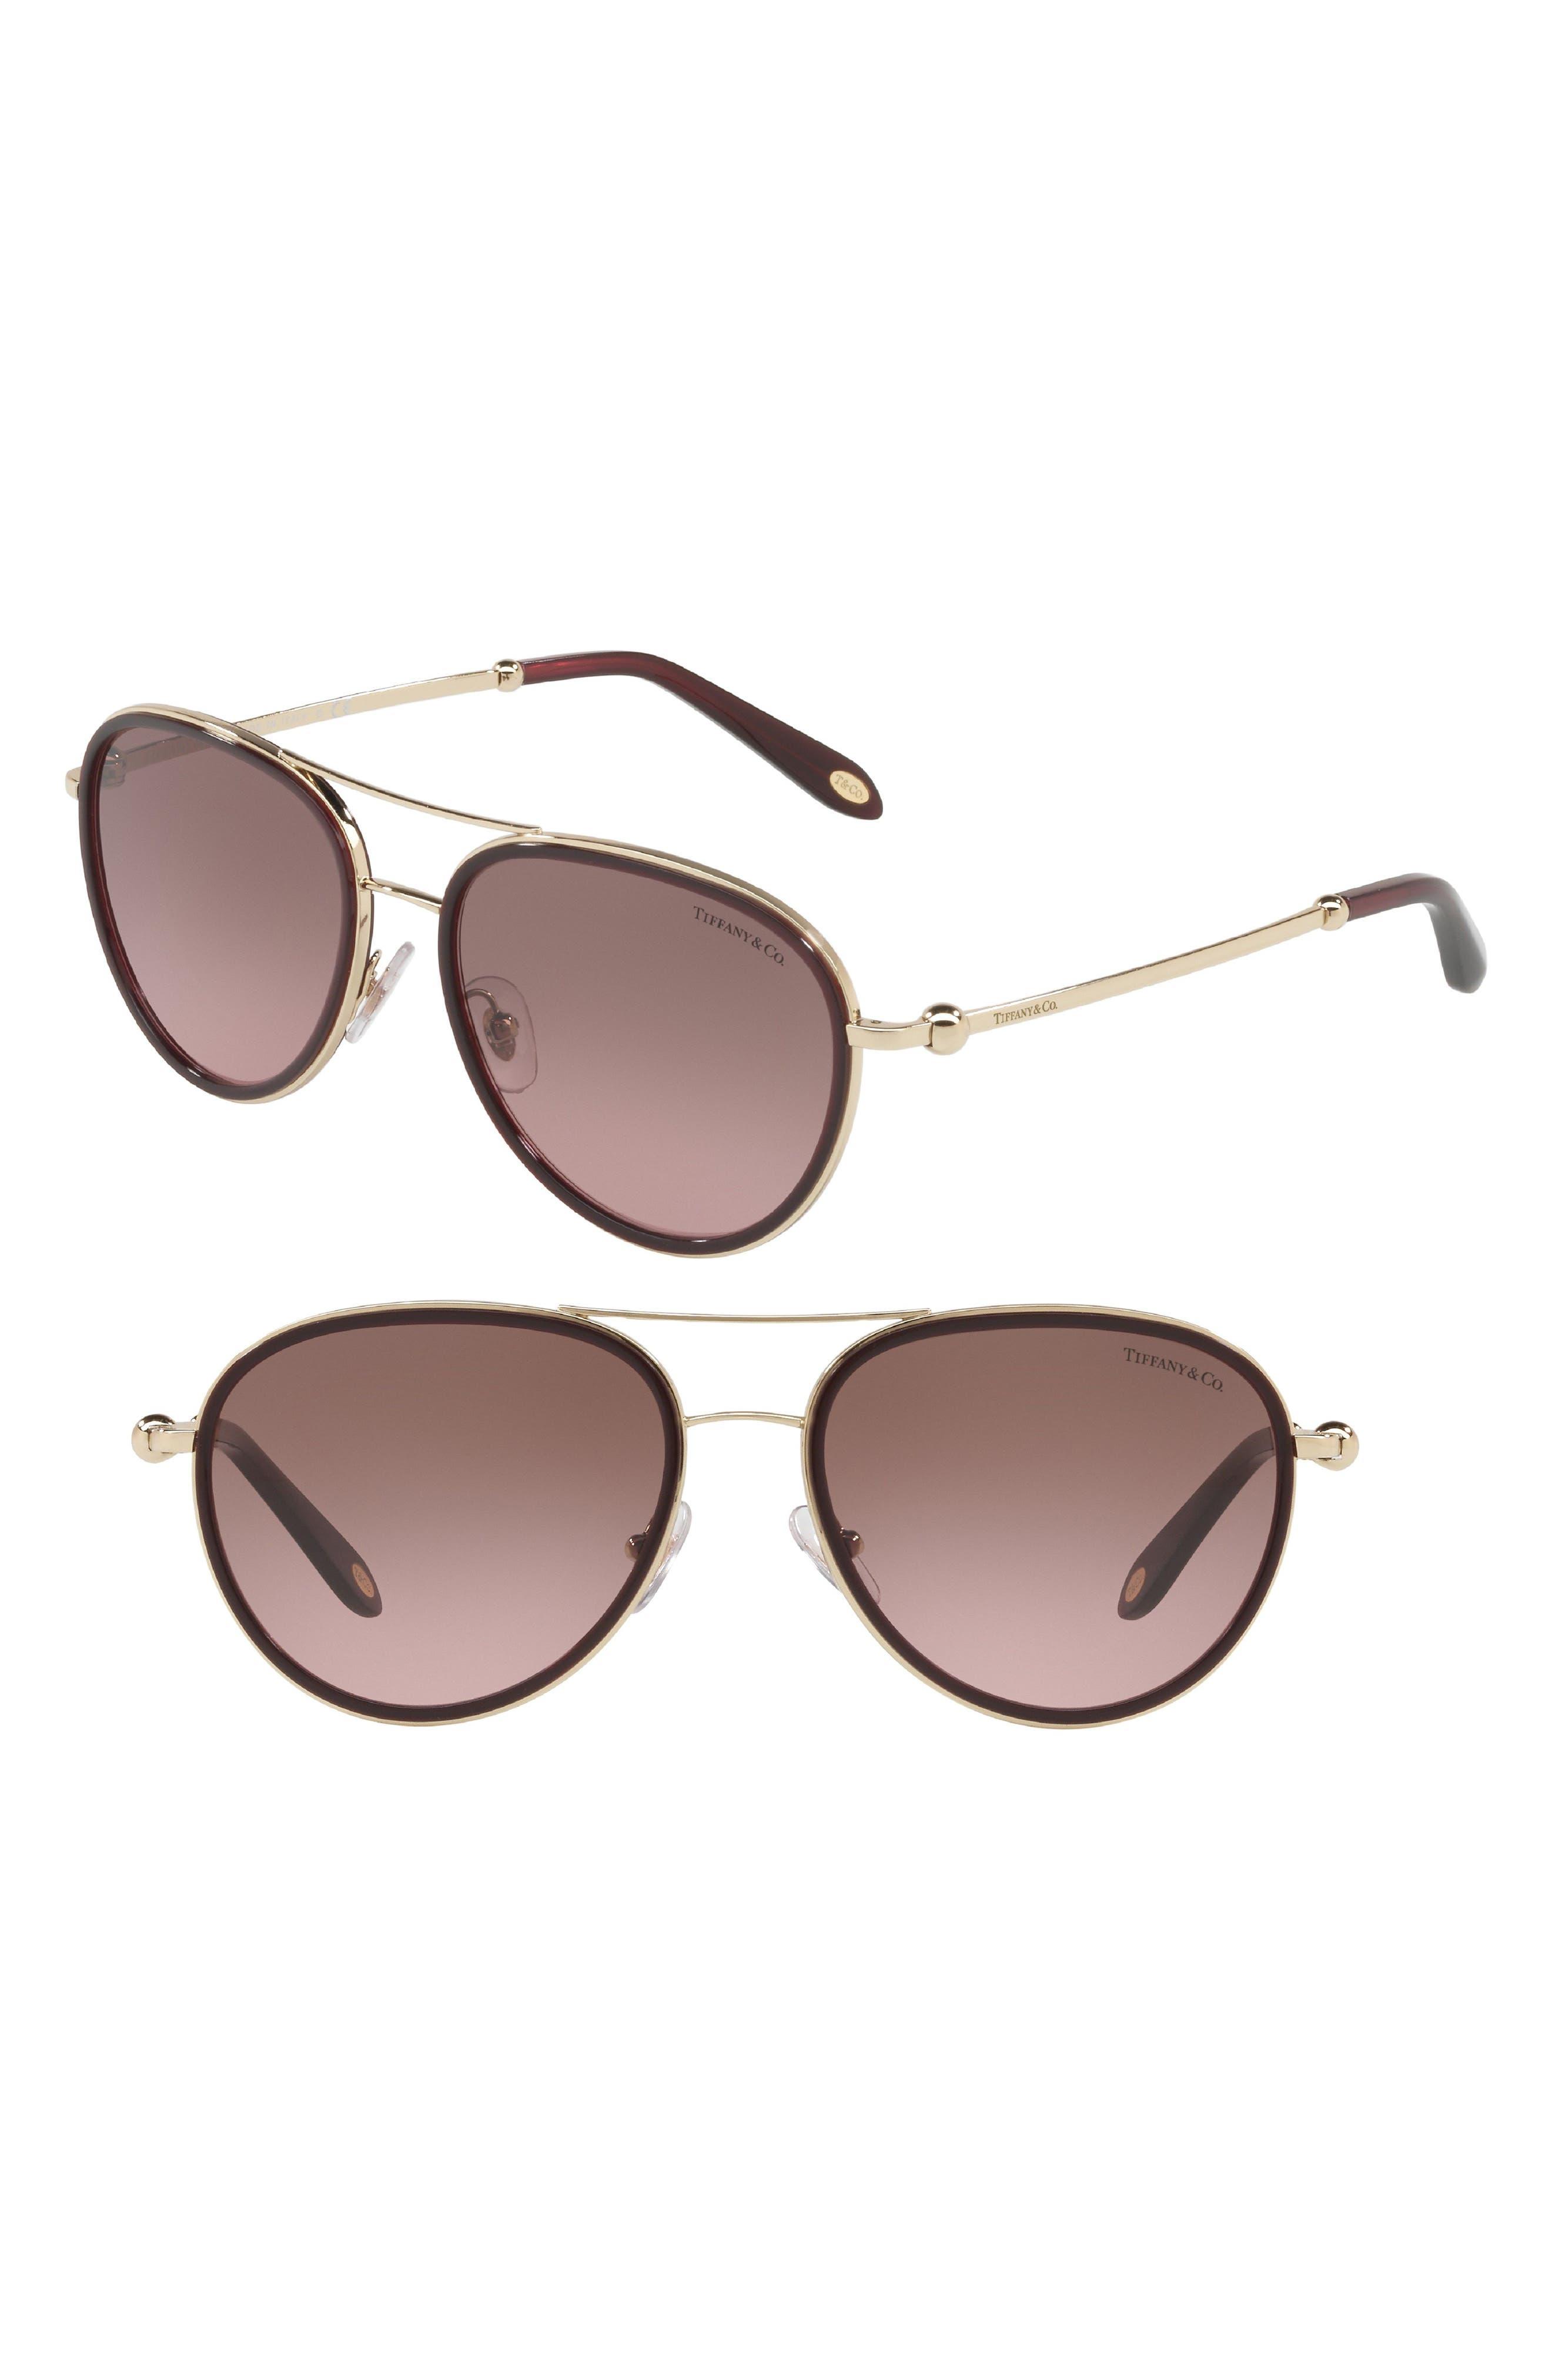 55mm Gradient Aviator Sunglasses,                         Main,                         color, Cherry Gradient